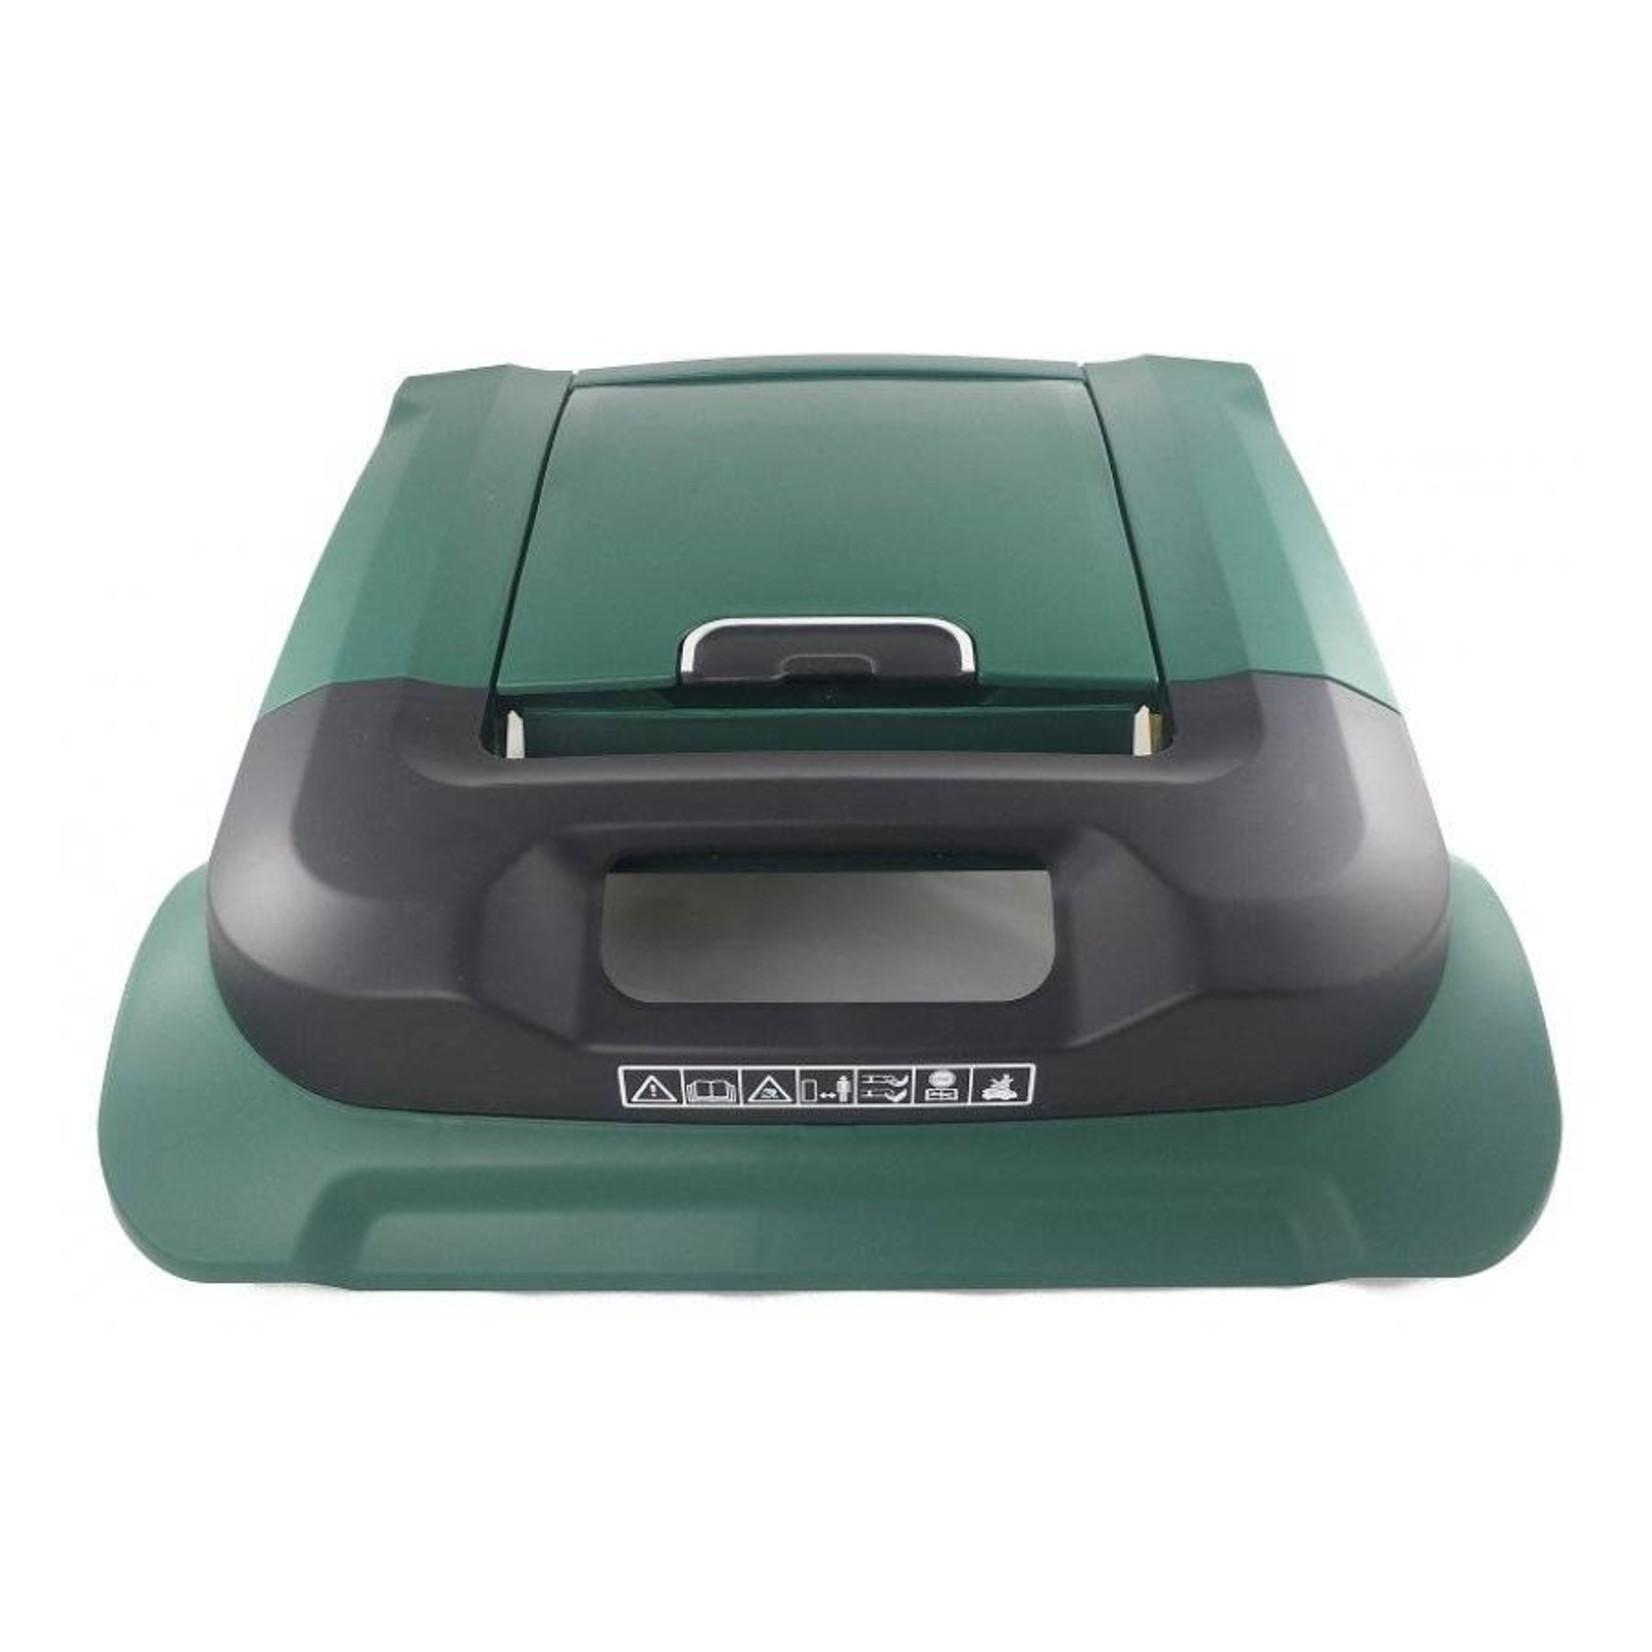 Robomow Robomow Haube/Abdeckung grün für S-Modelle MSB6008B